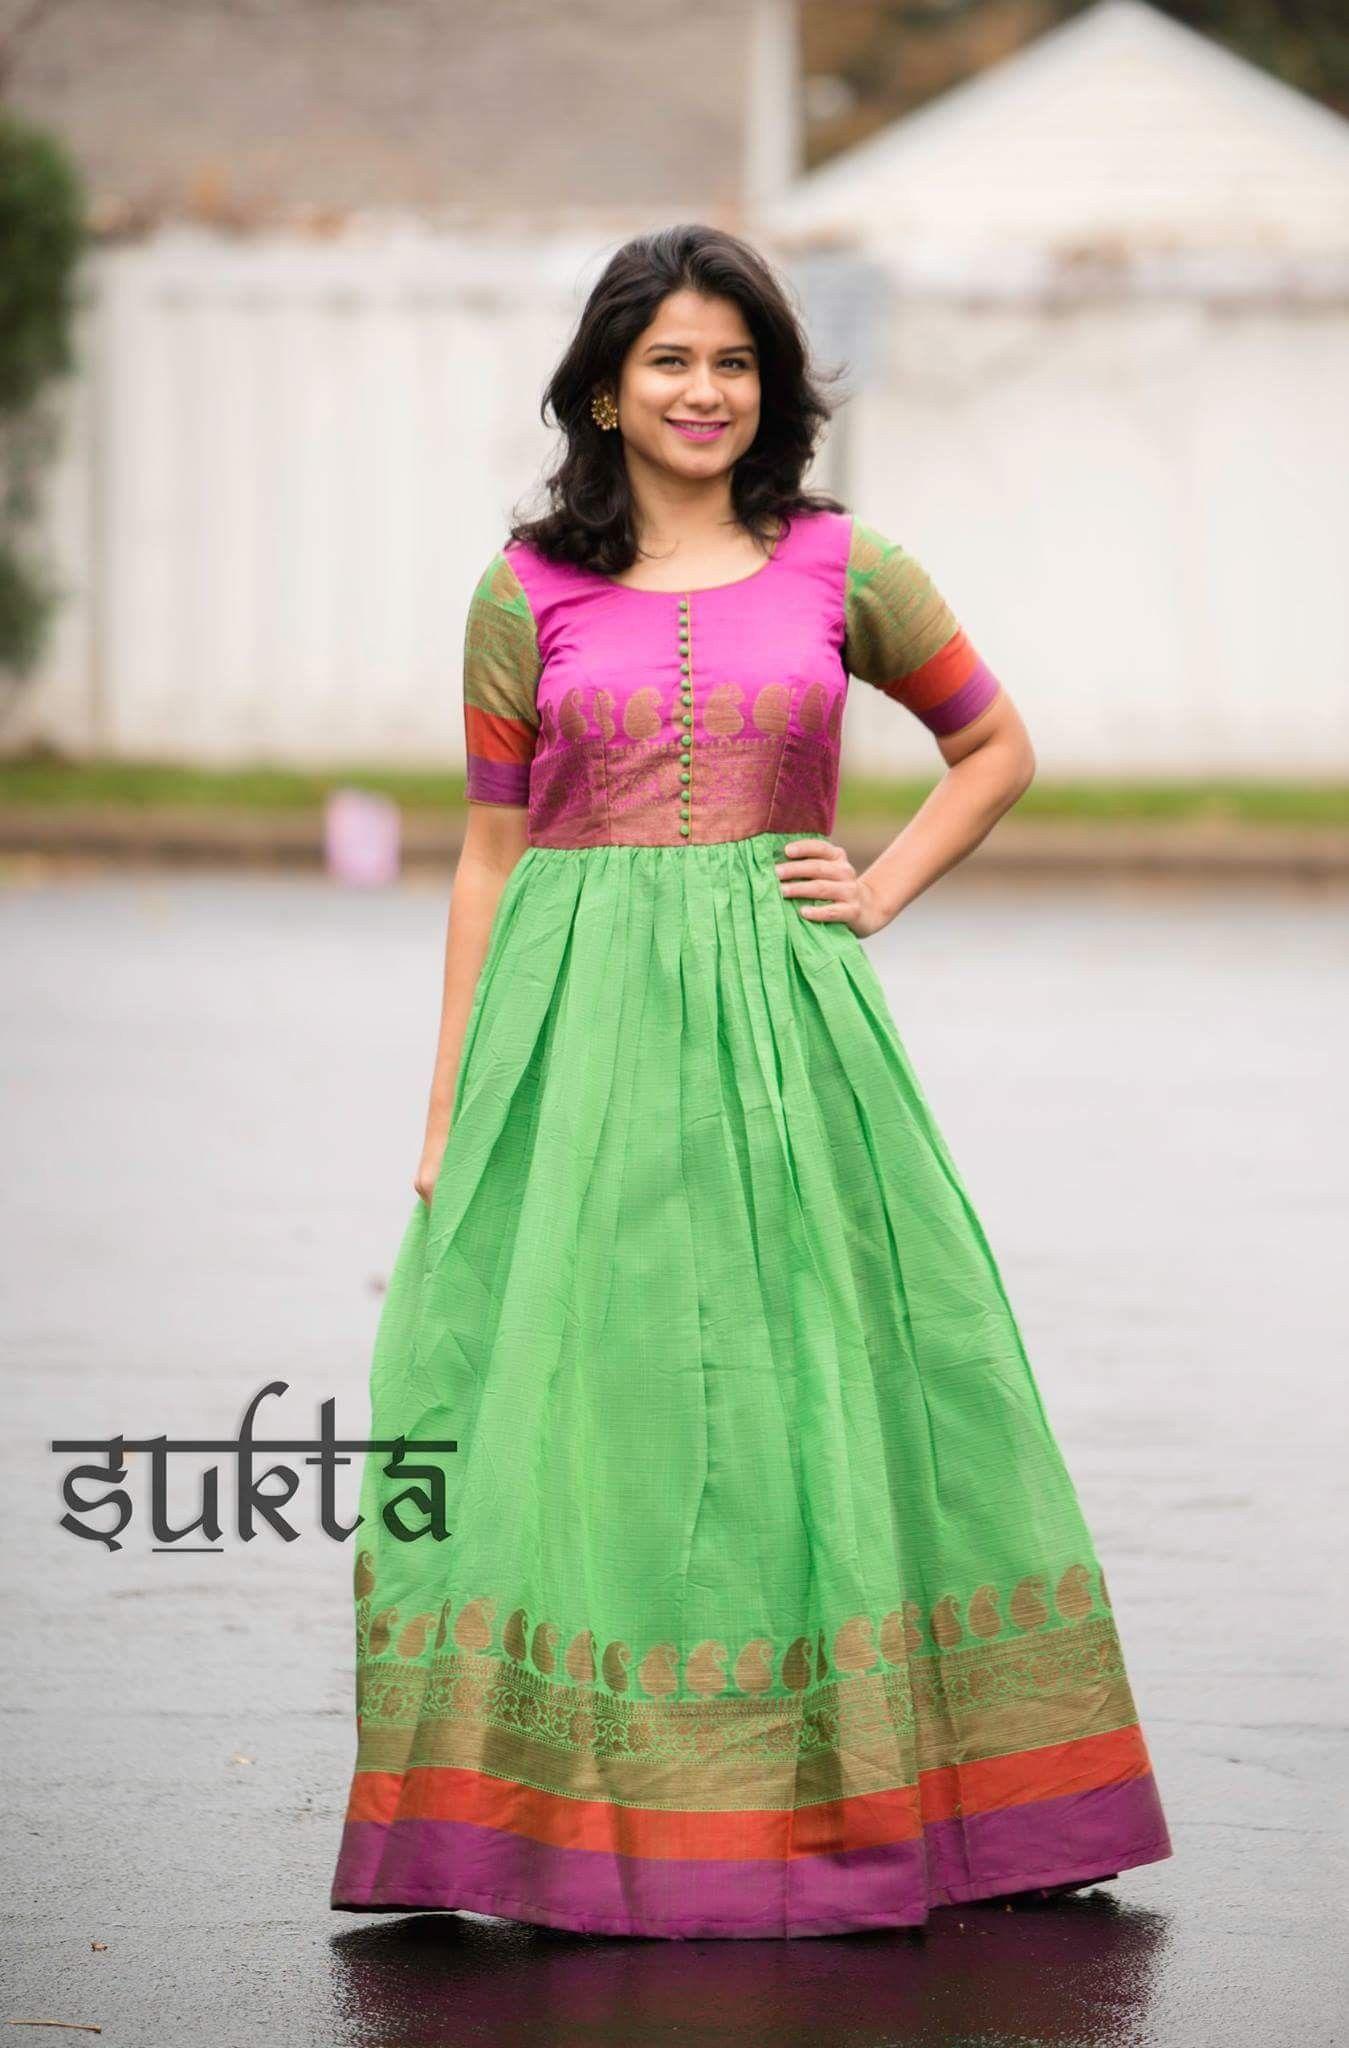 Dress designs #saridress